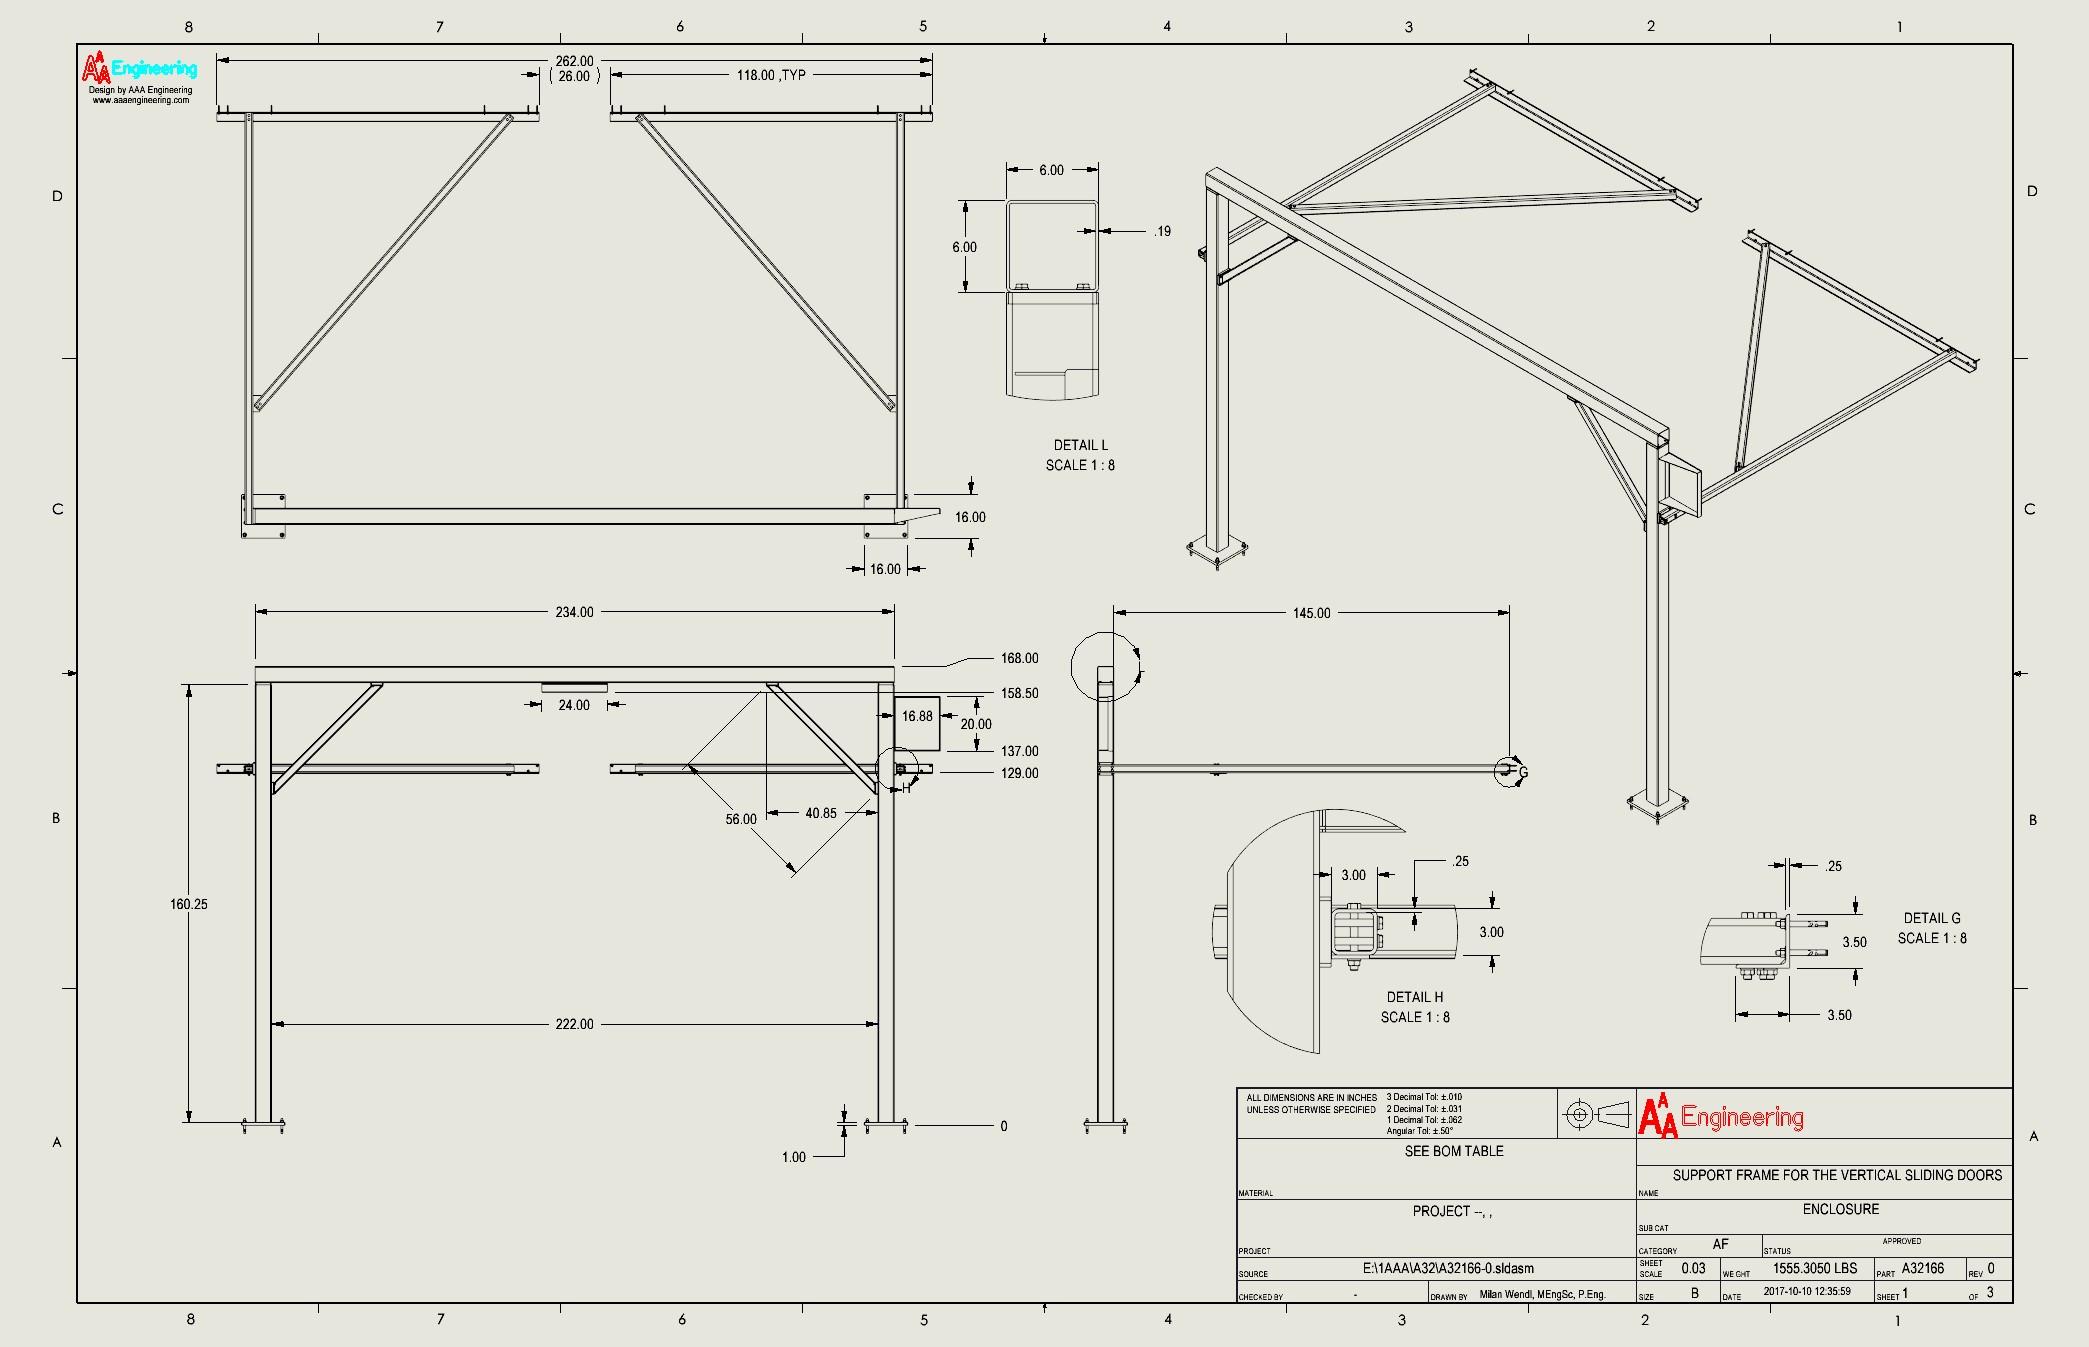 Vertical Sliding Door Support System 2